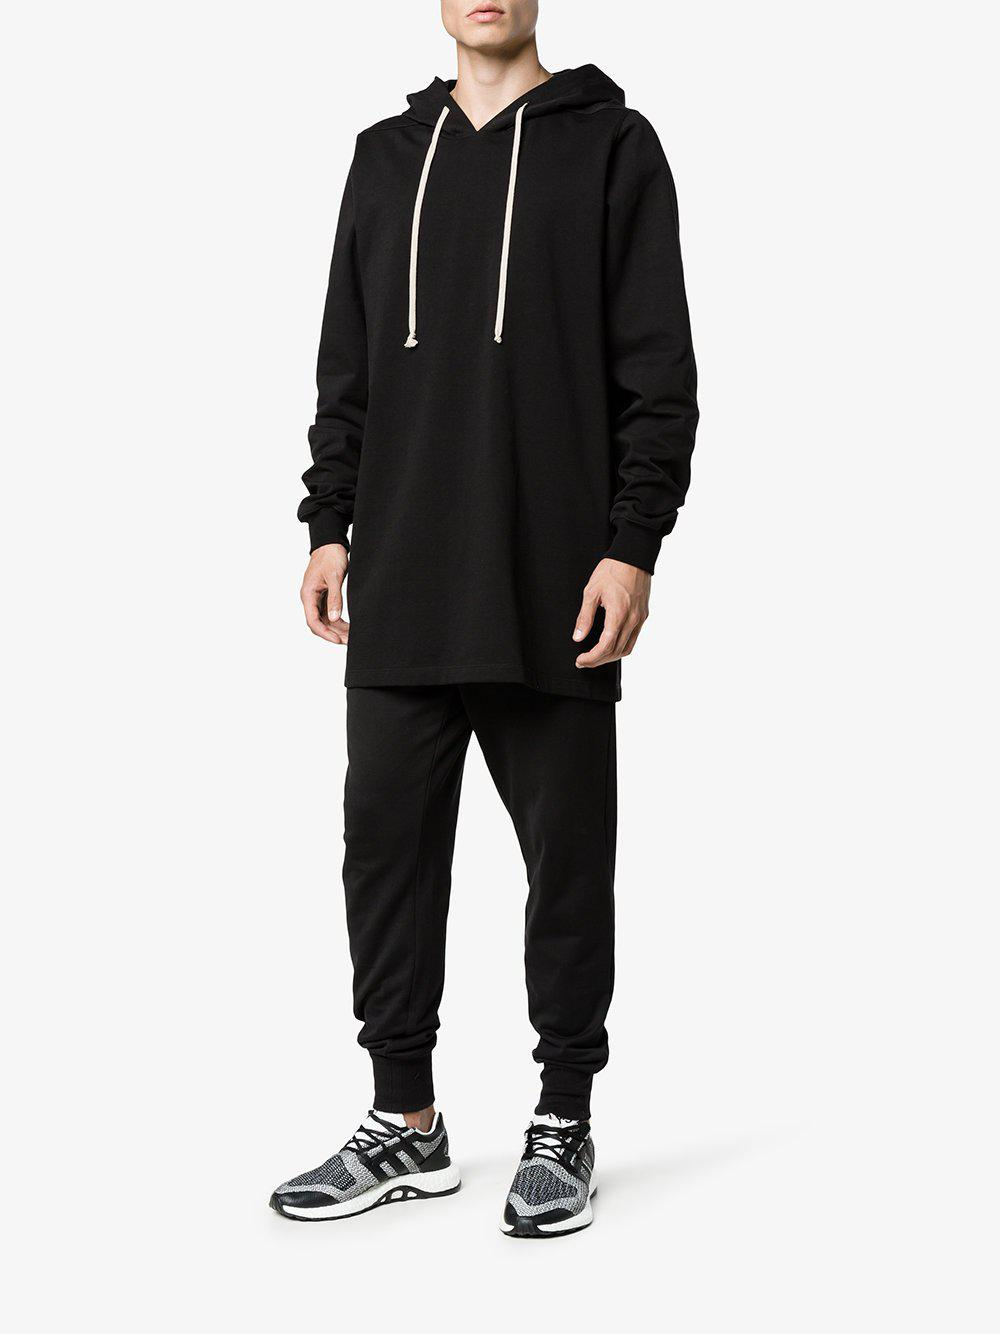 adidas Pureboost Core Black White Sneaker in Black Lyst